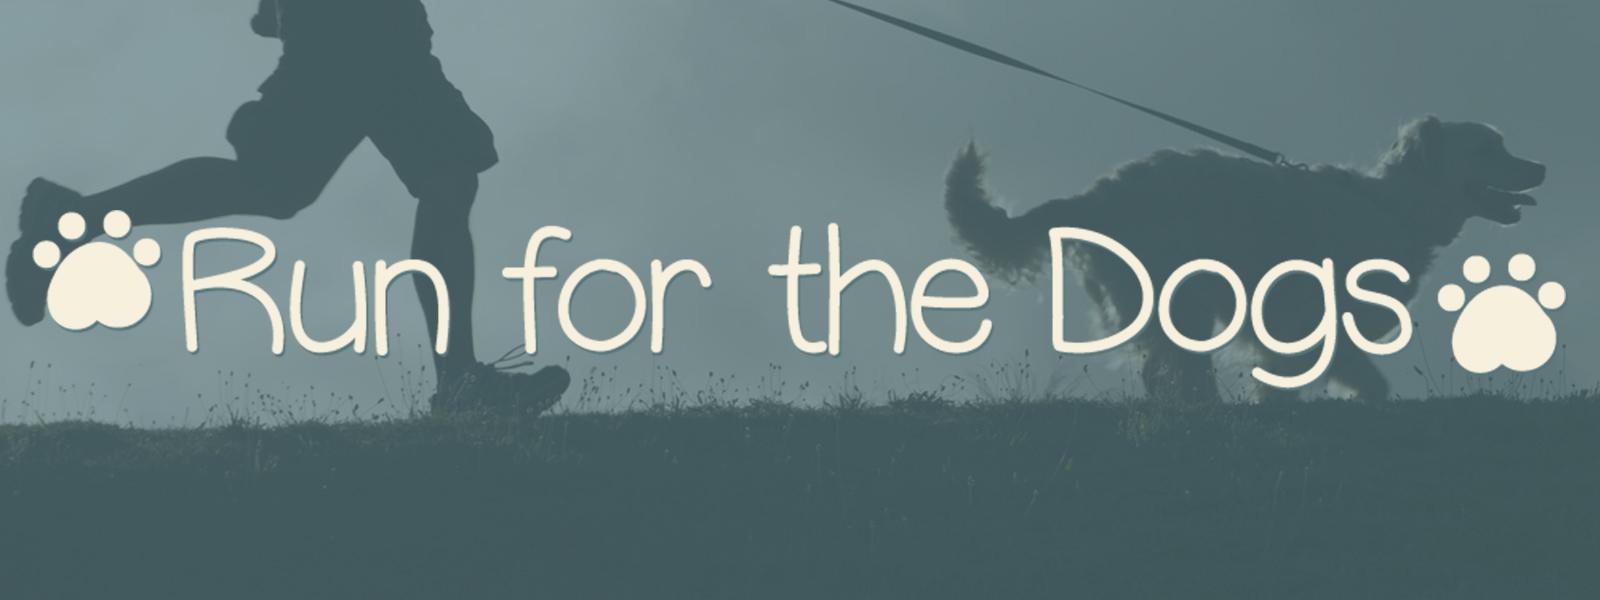 Run For the Dogs, Saturday, November 11, 2017